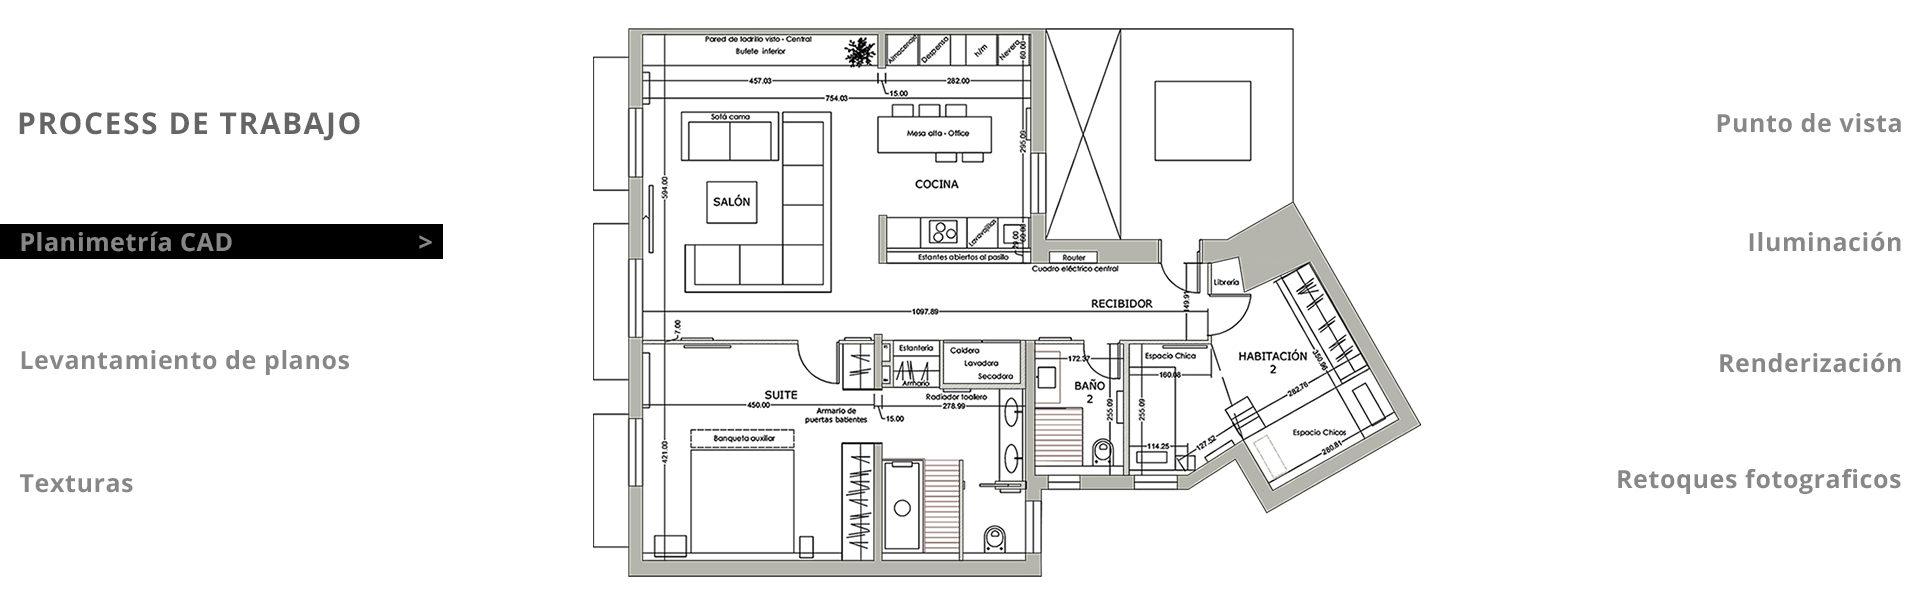 Planimetria CAD